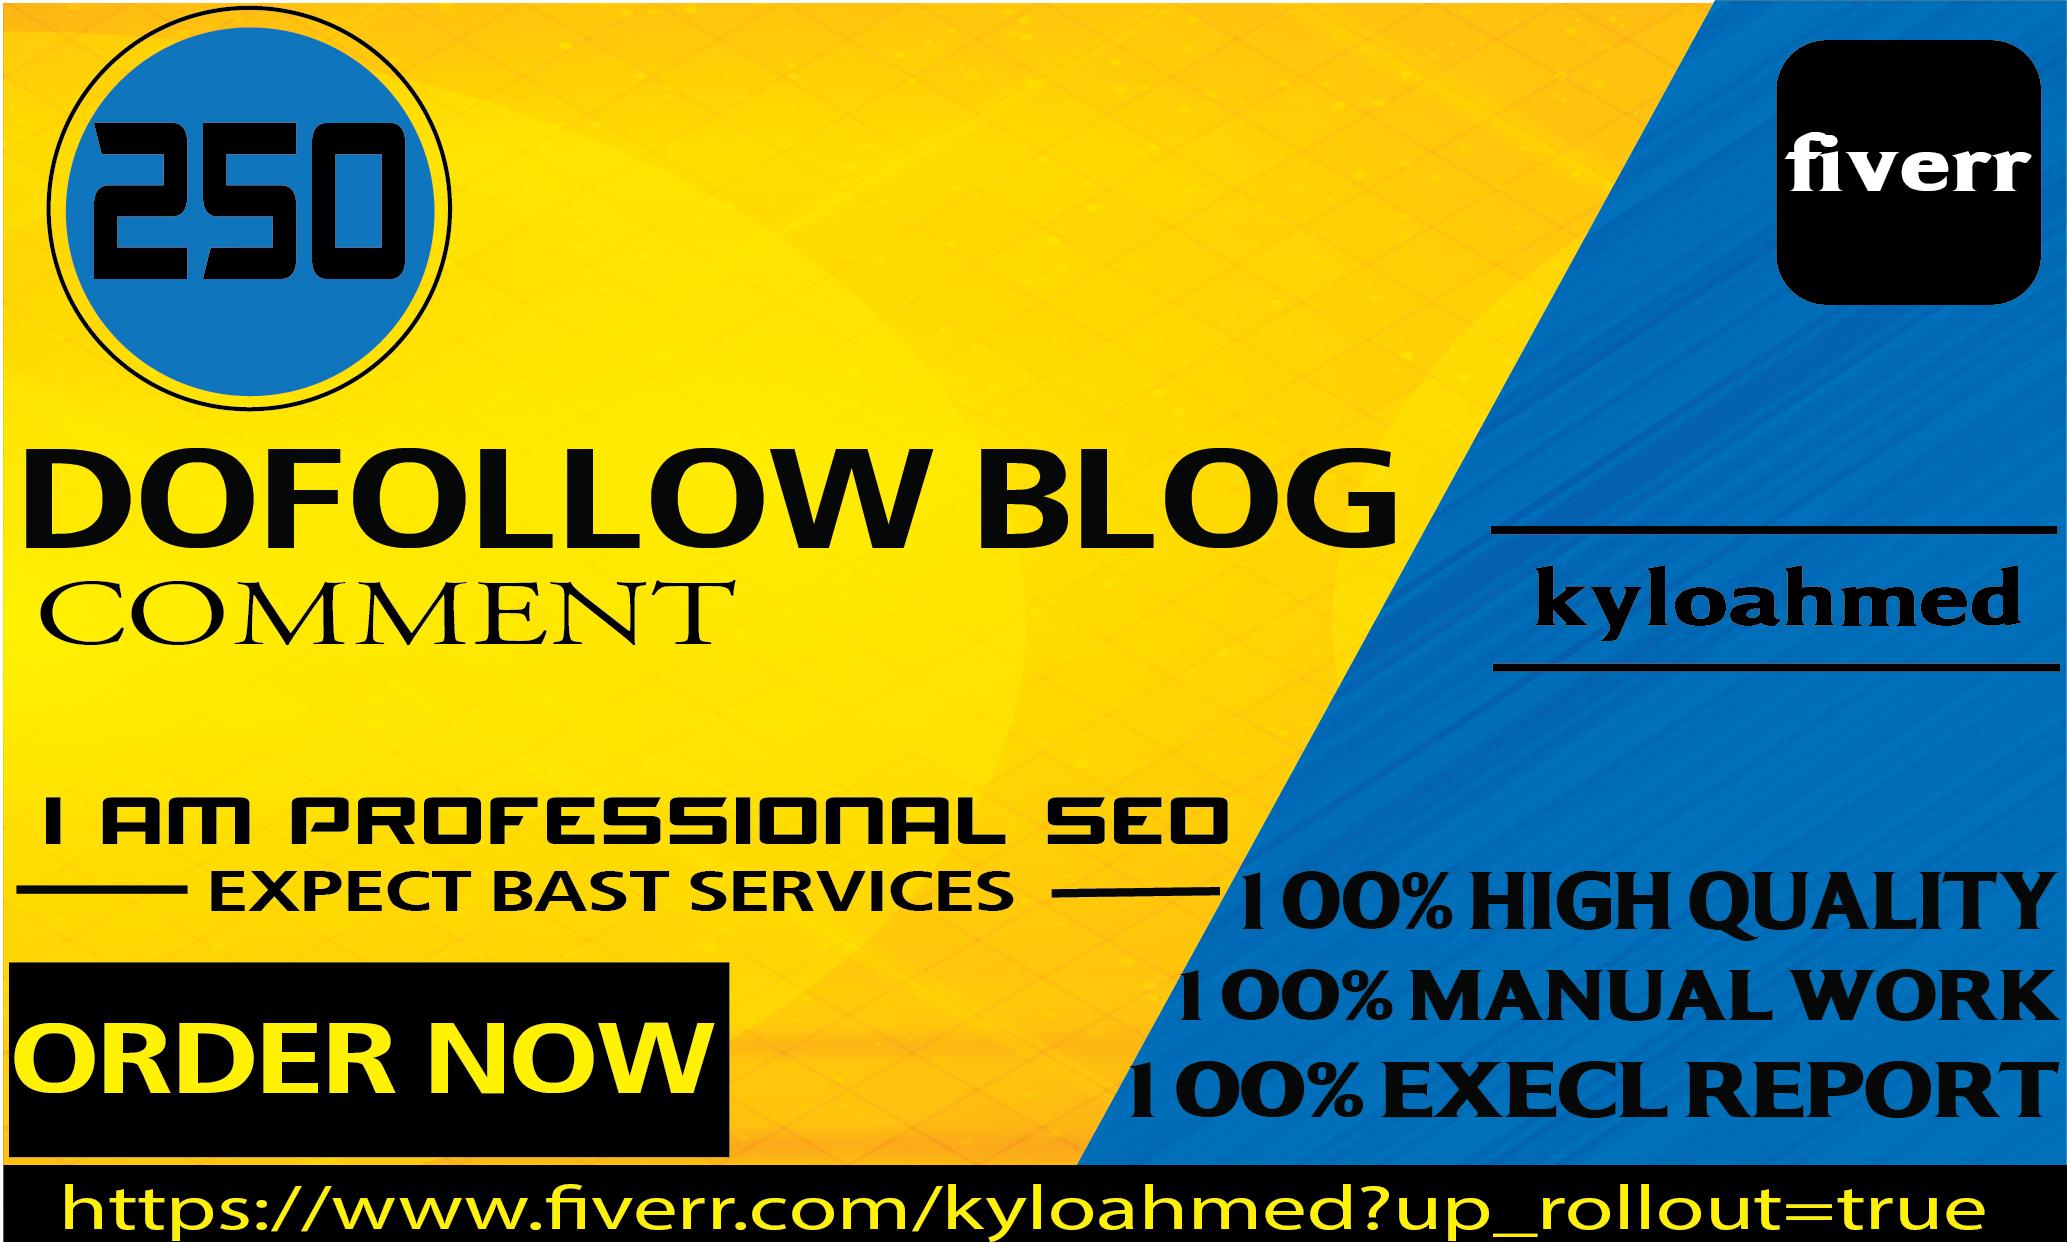 I will provide 250 dofollow blog comment backlinks